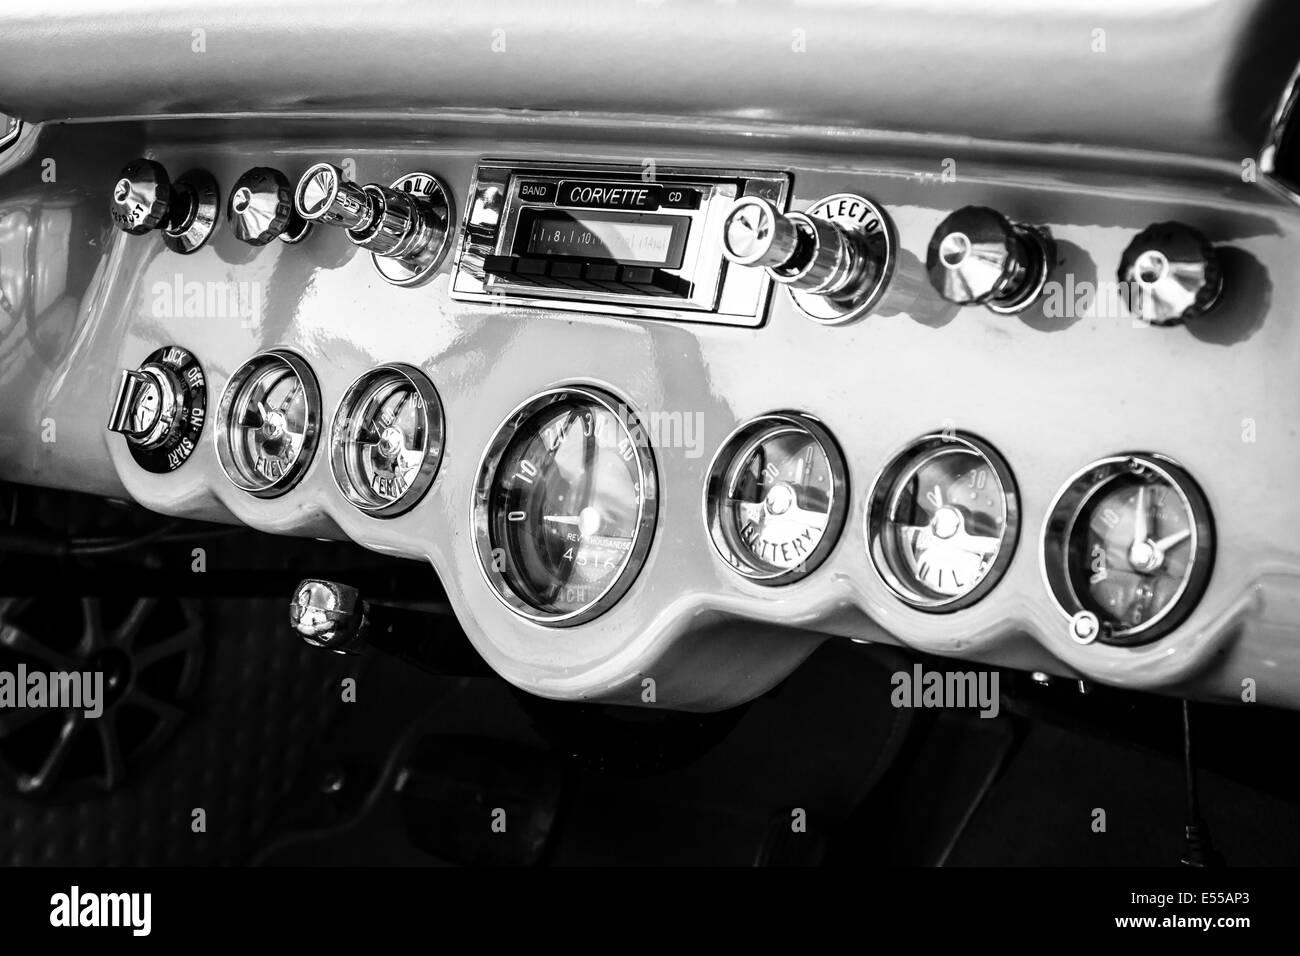 Armaturenbrett oldtimer  Armaturenbrett eines Sportwagens Chevrolet Corvette (C1). Schwarz ...